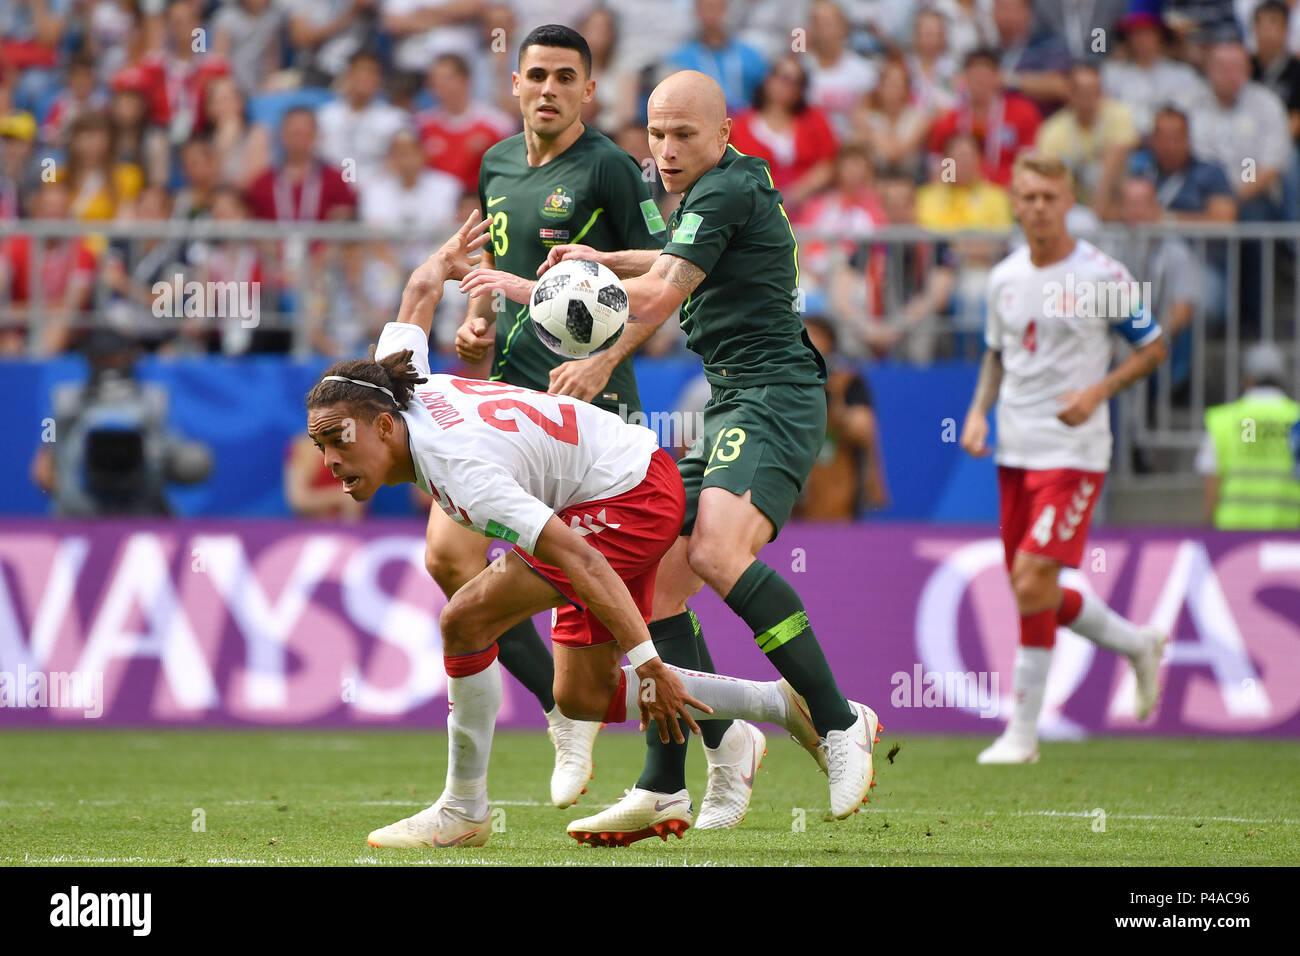 Yussuf Yurary POULSEN (DEN), Action, duels versus Aaron MOOY (AUS). Hi: Tom ROGIC (OFF). Denmark (DEN) - Australia (AUS) 1-1, Preliminary Round, Group C, Match 22, on 21.06.2018 in Samara, Samara Arena. Football World Cup 2018 in Russia from 14.06. - 15.07.2018. | usage worldwide - Stock Image